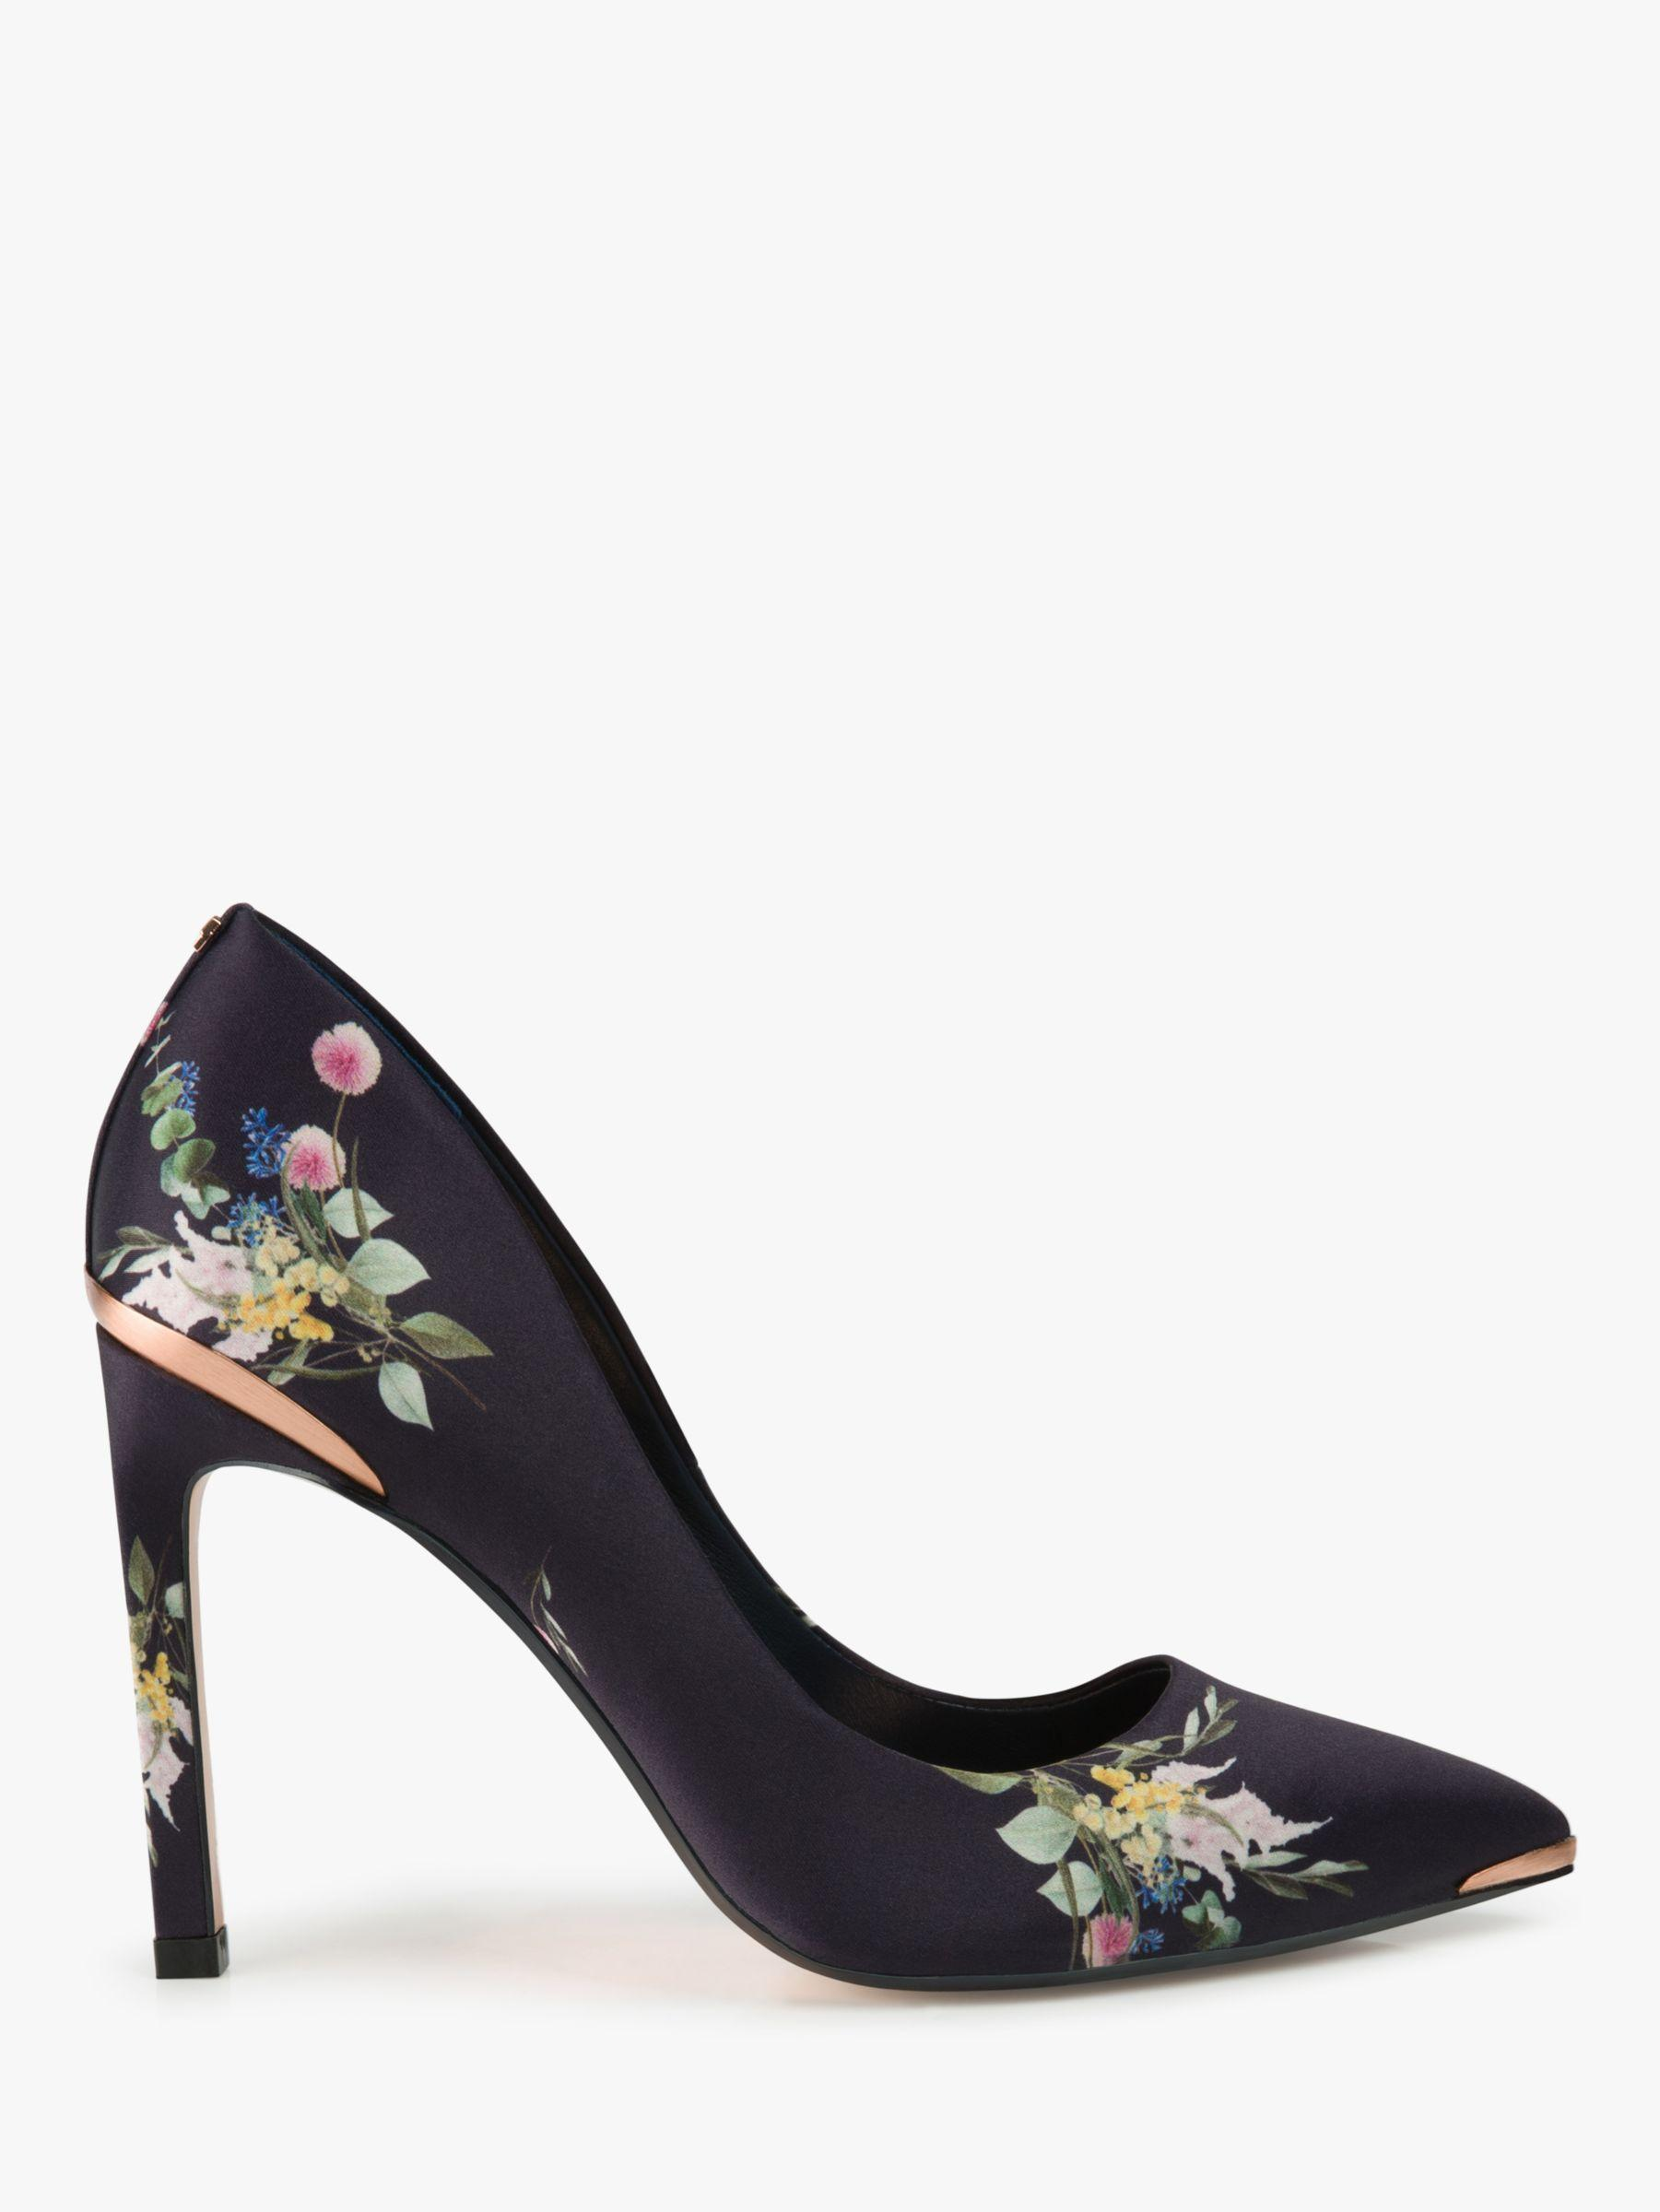 3dfda6f3f Ted Baker Melnip Stiletto Heel Court Shoes in Blue - Save 20% - Lyst